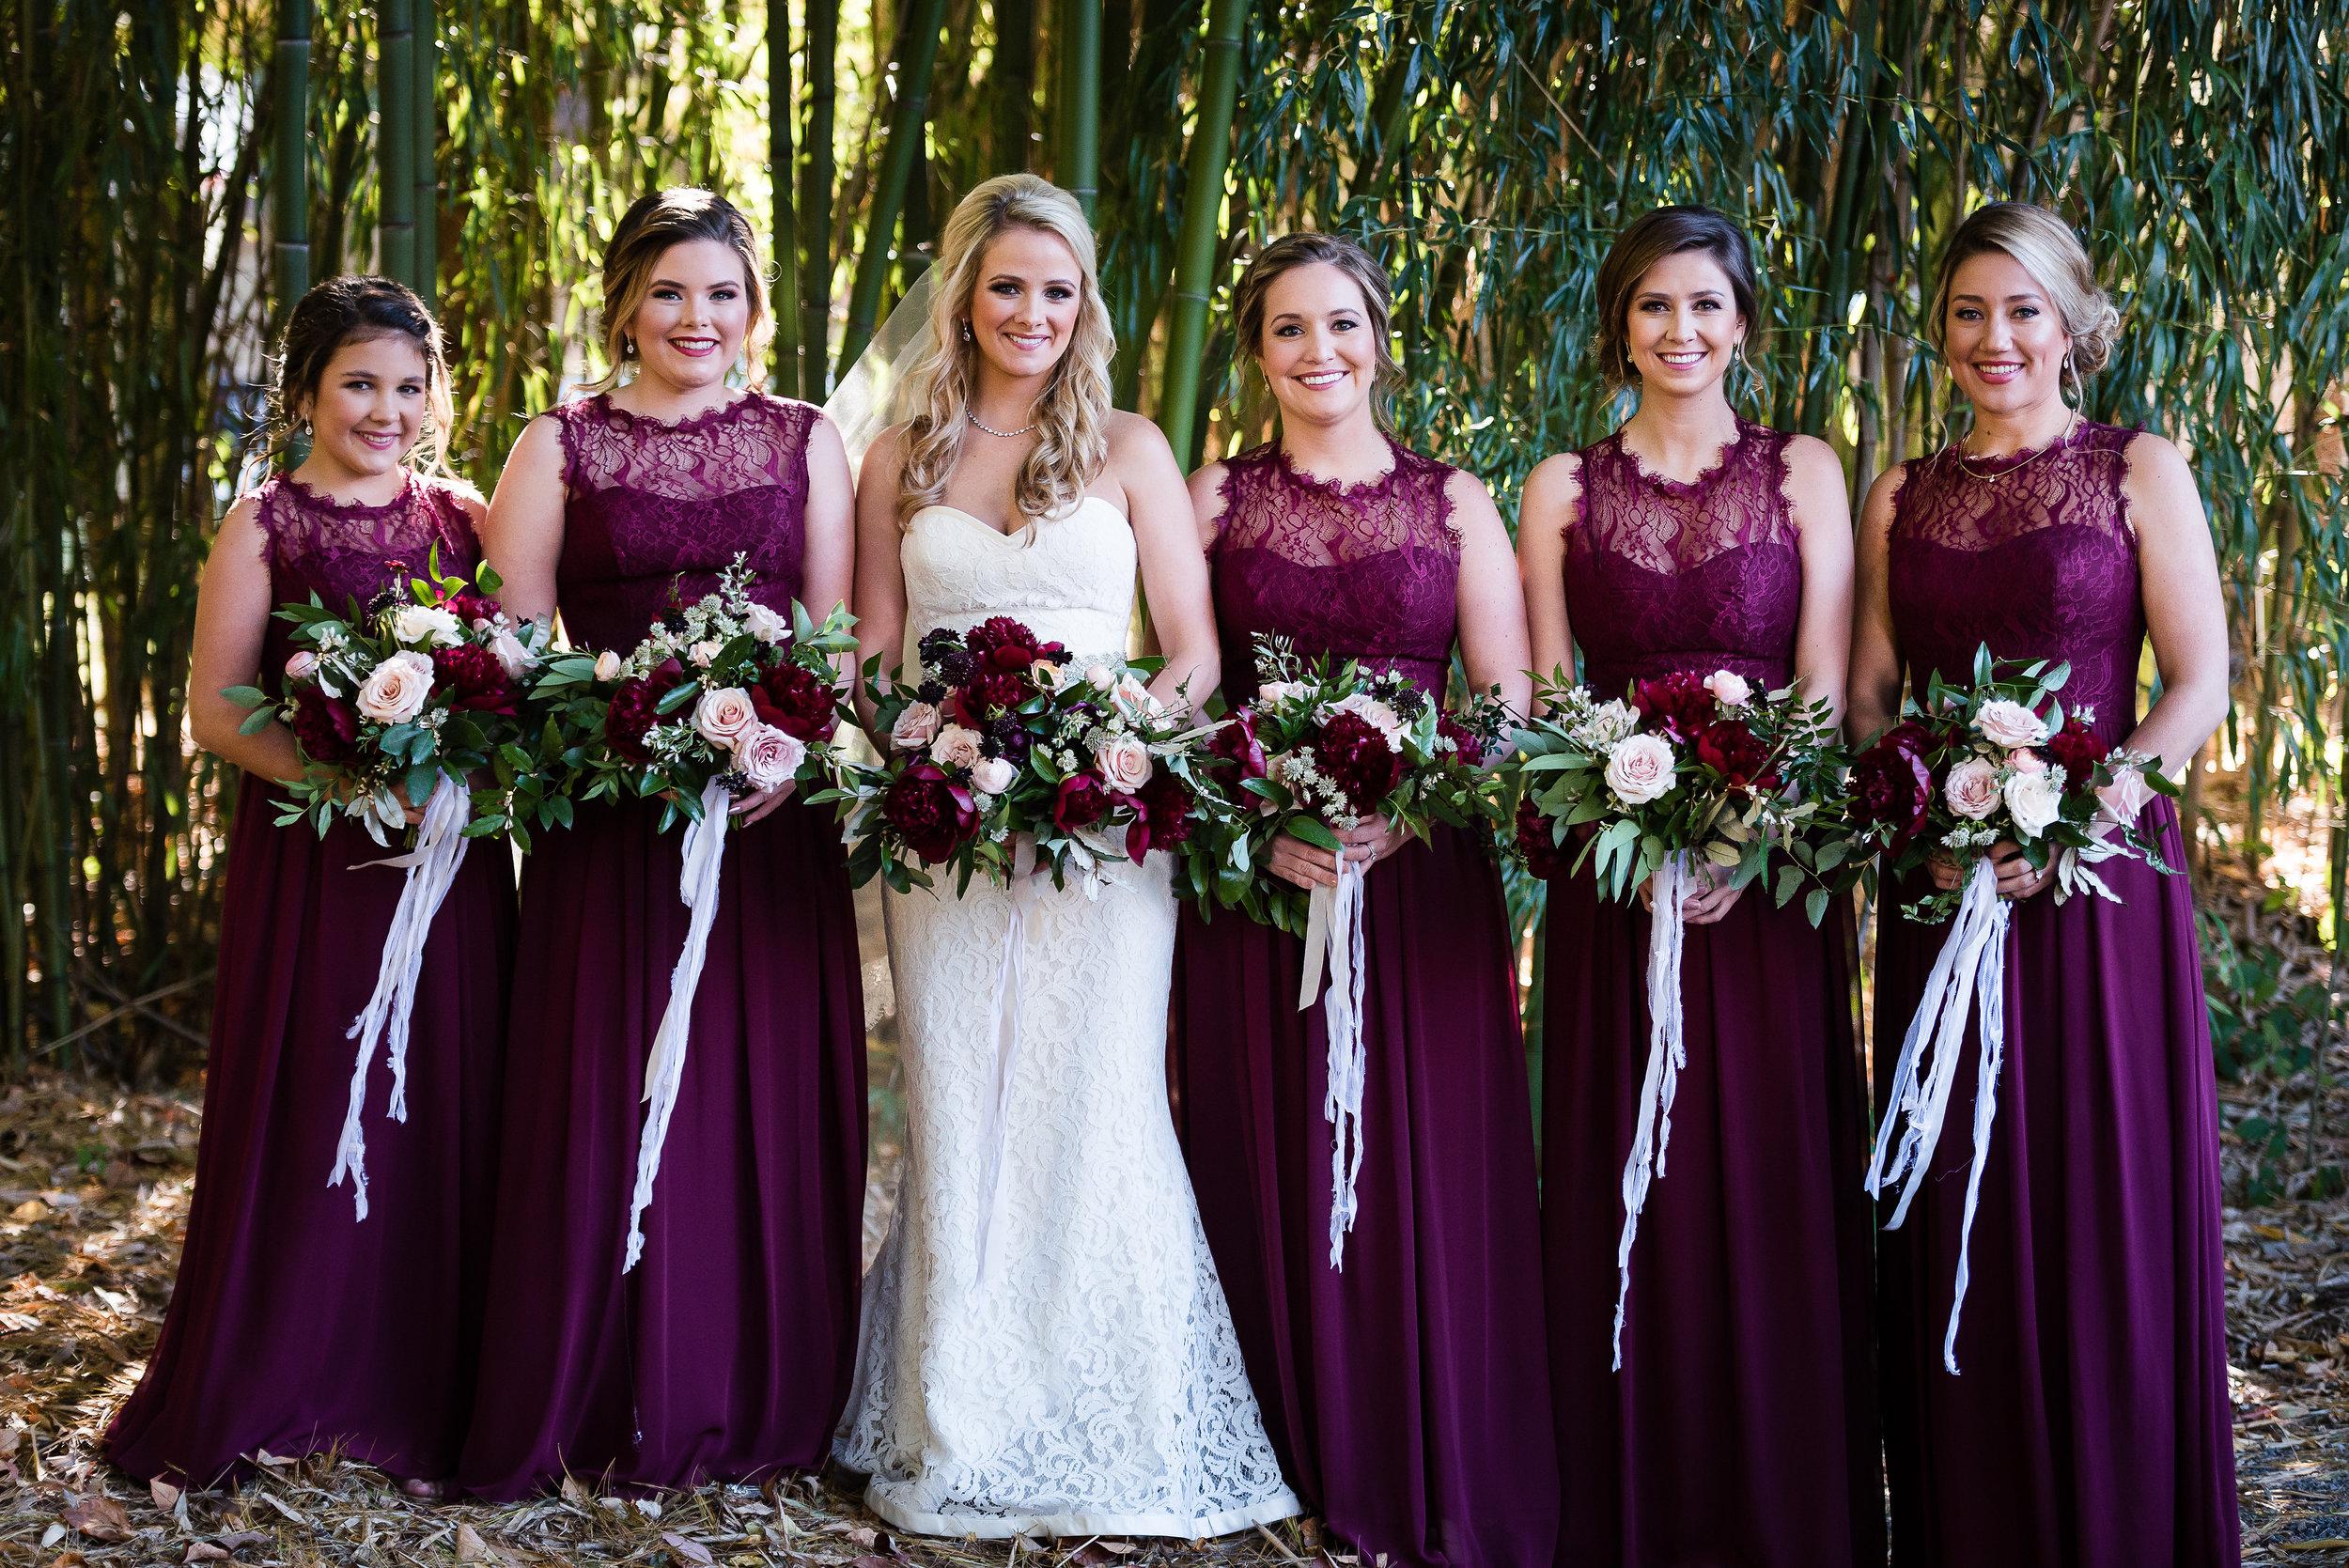 20161022_hawkesdene_fall_wedding_photos_0404.jpg